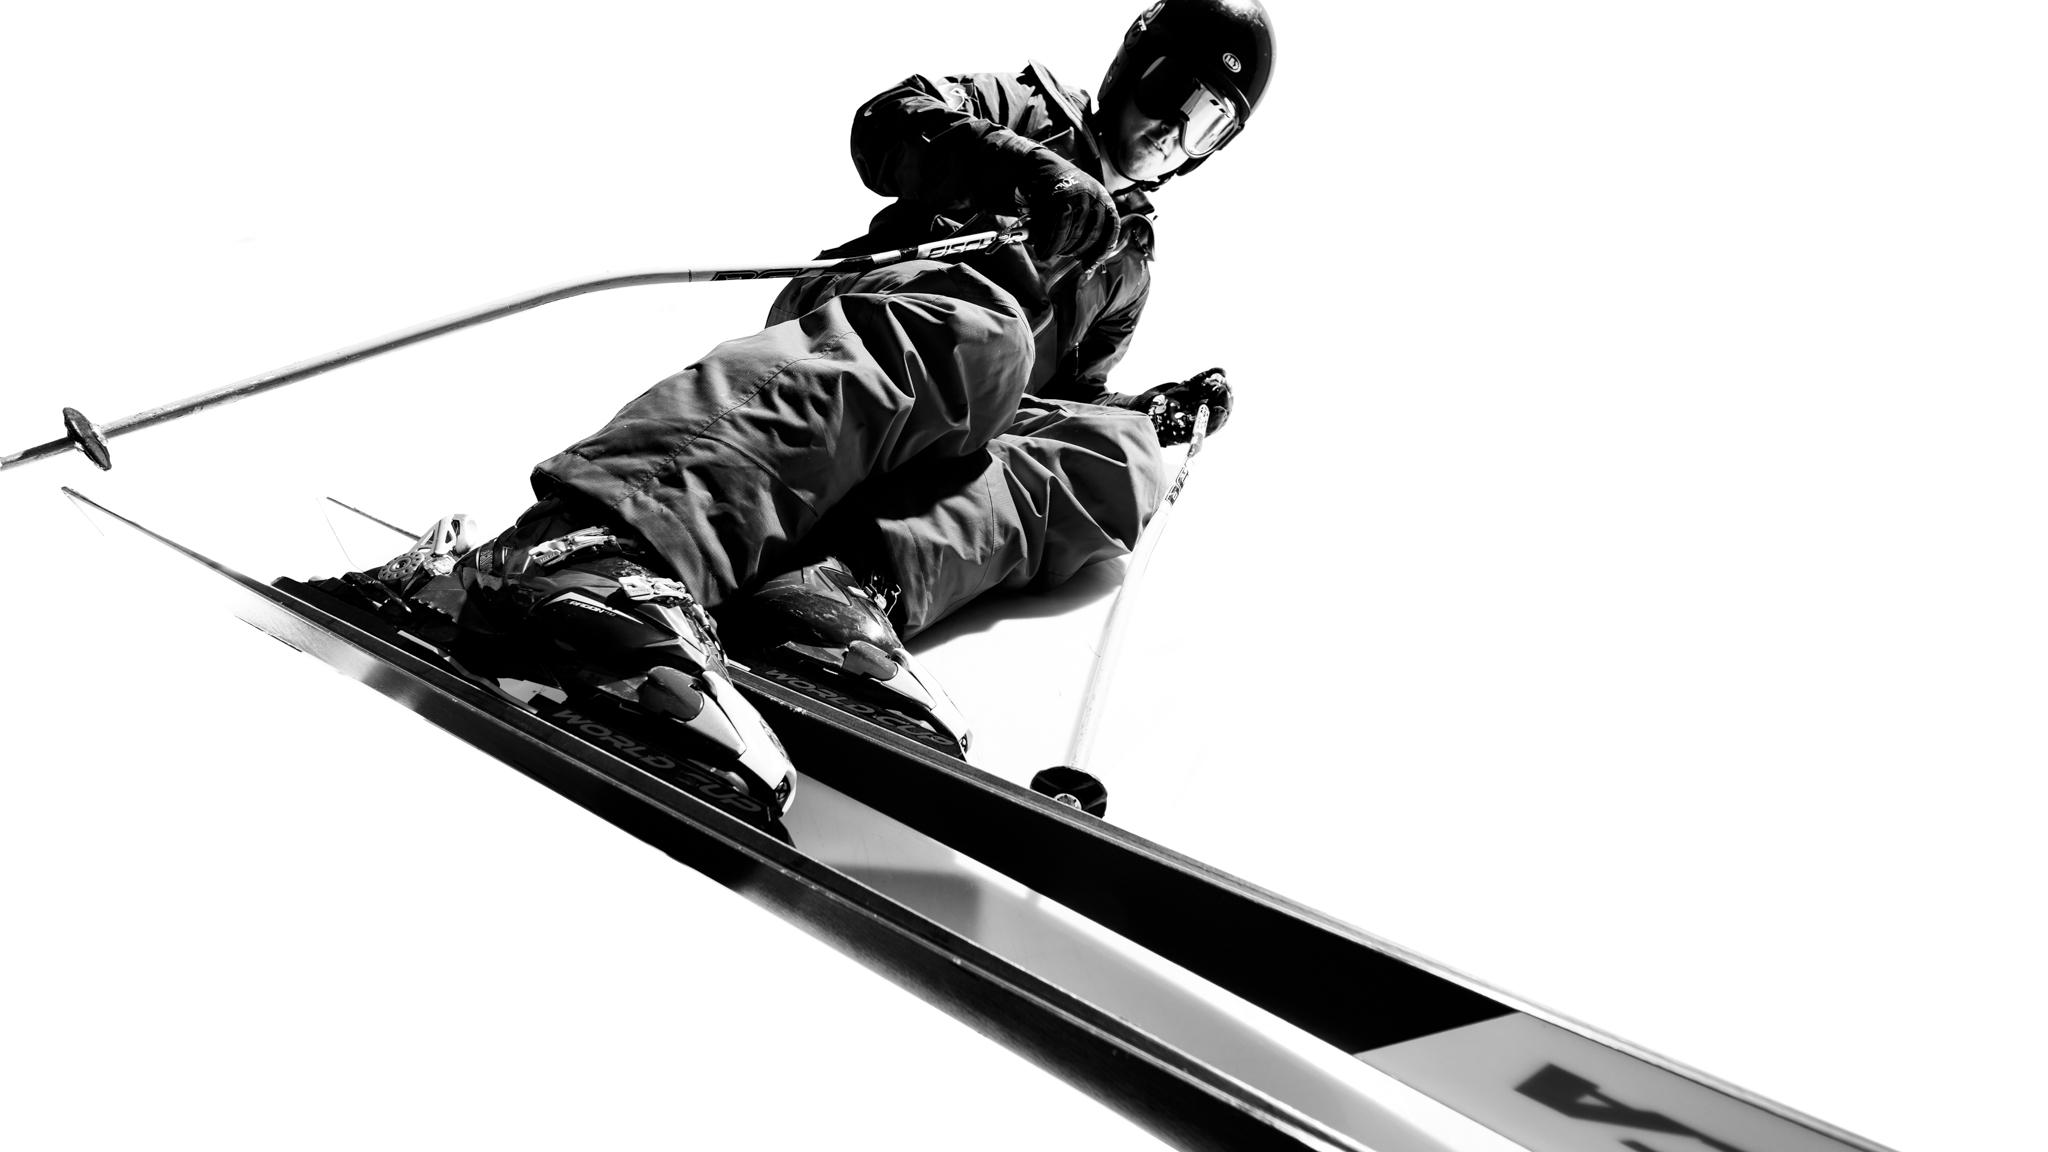 skier__.jpg